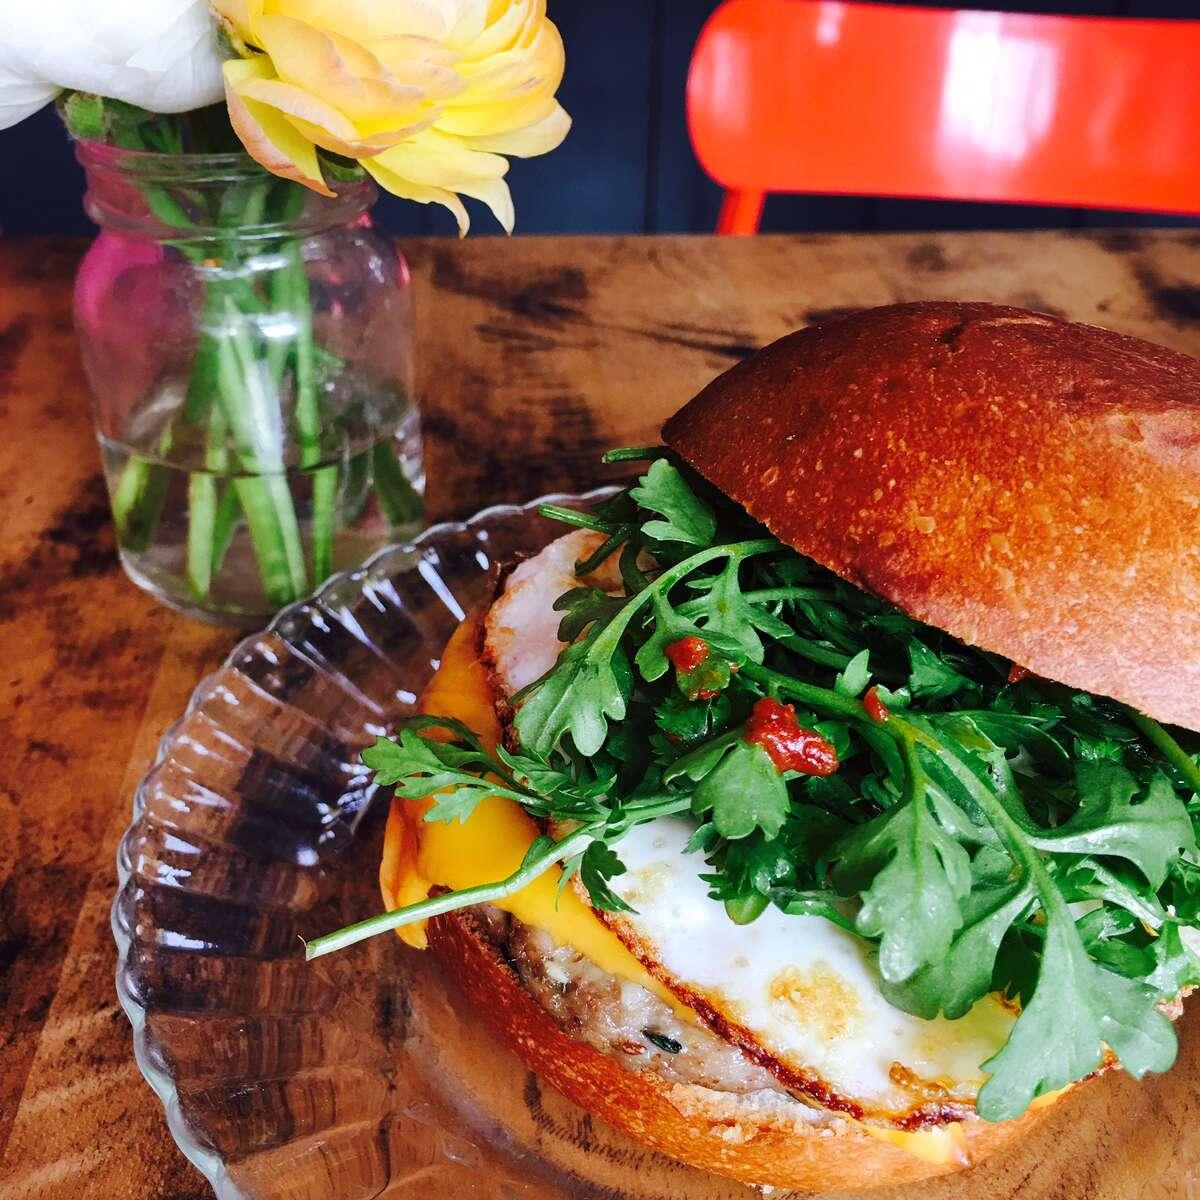 Mumbai Morning Burger: pork ginger sausage, fried egg, American cheese, peppercress, ghost pepper chutney